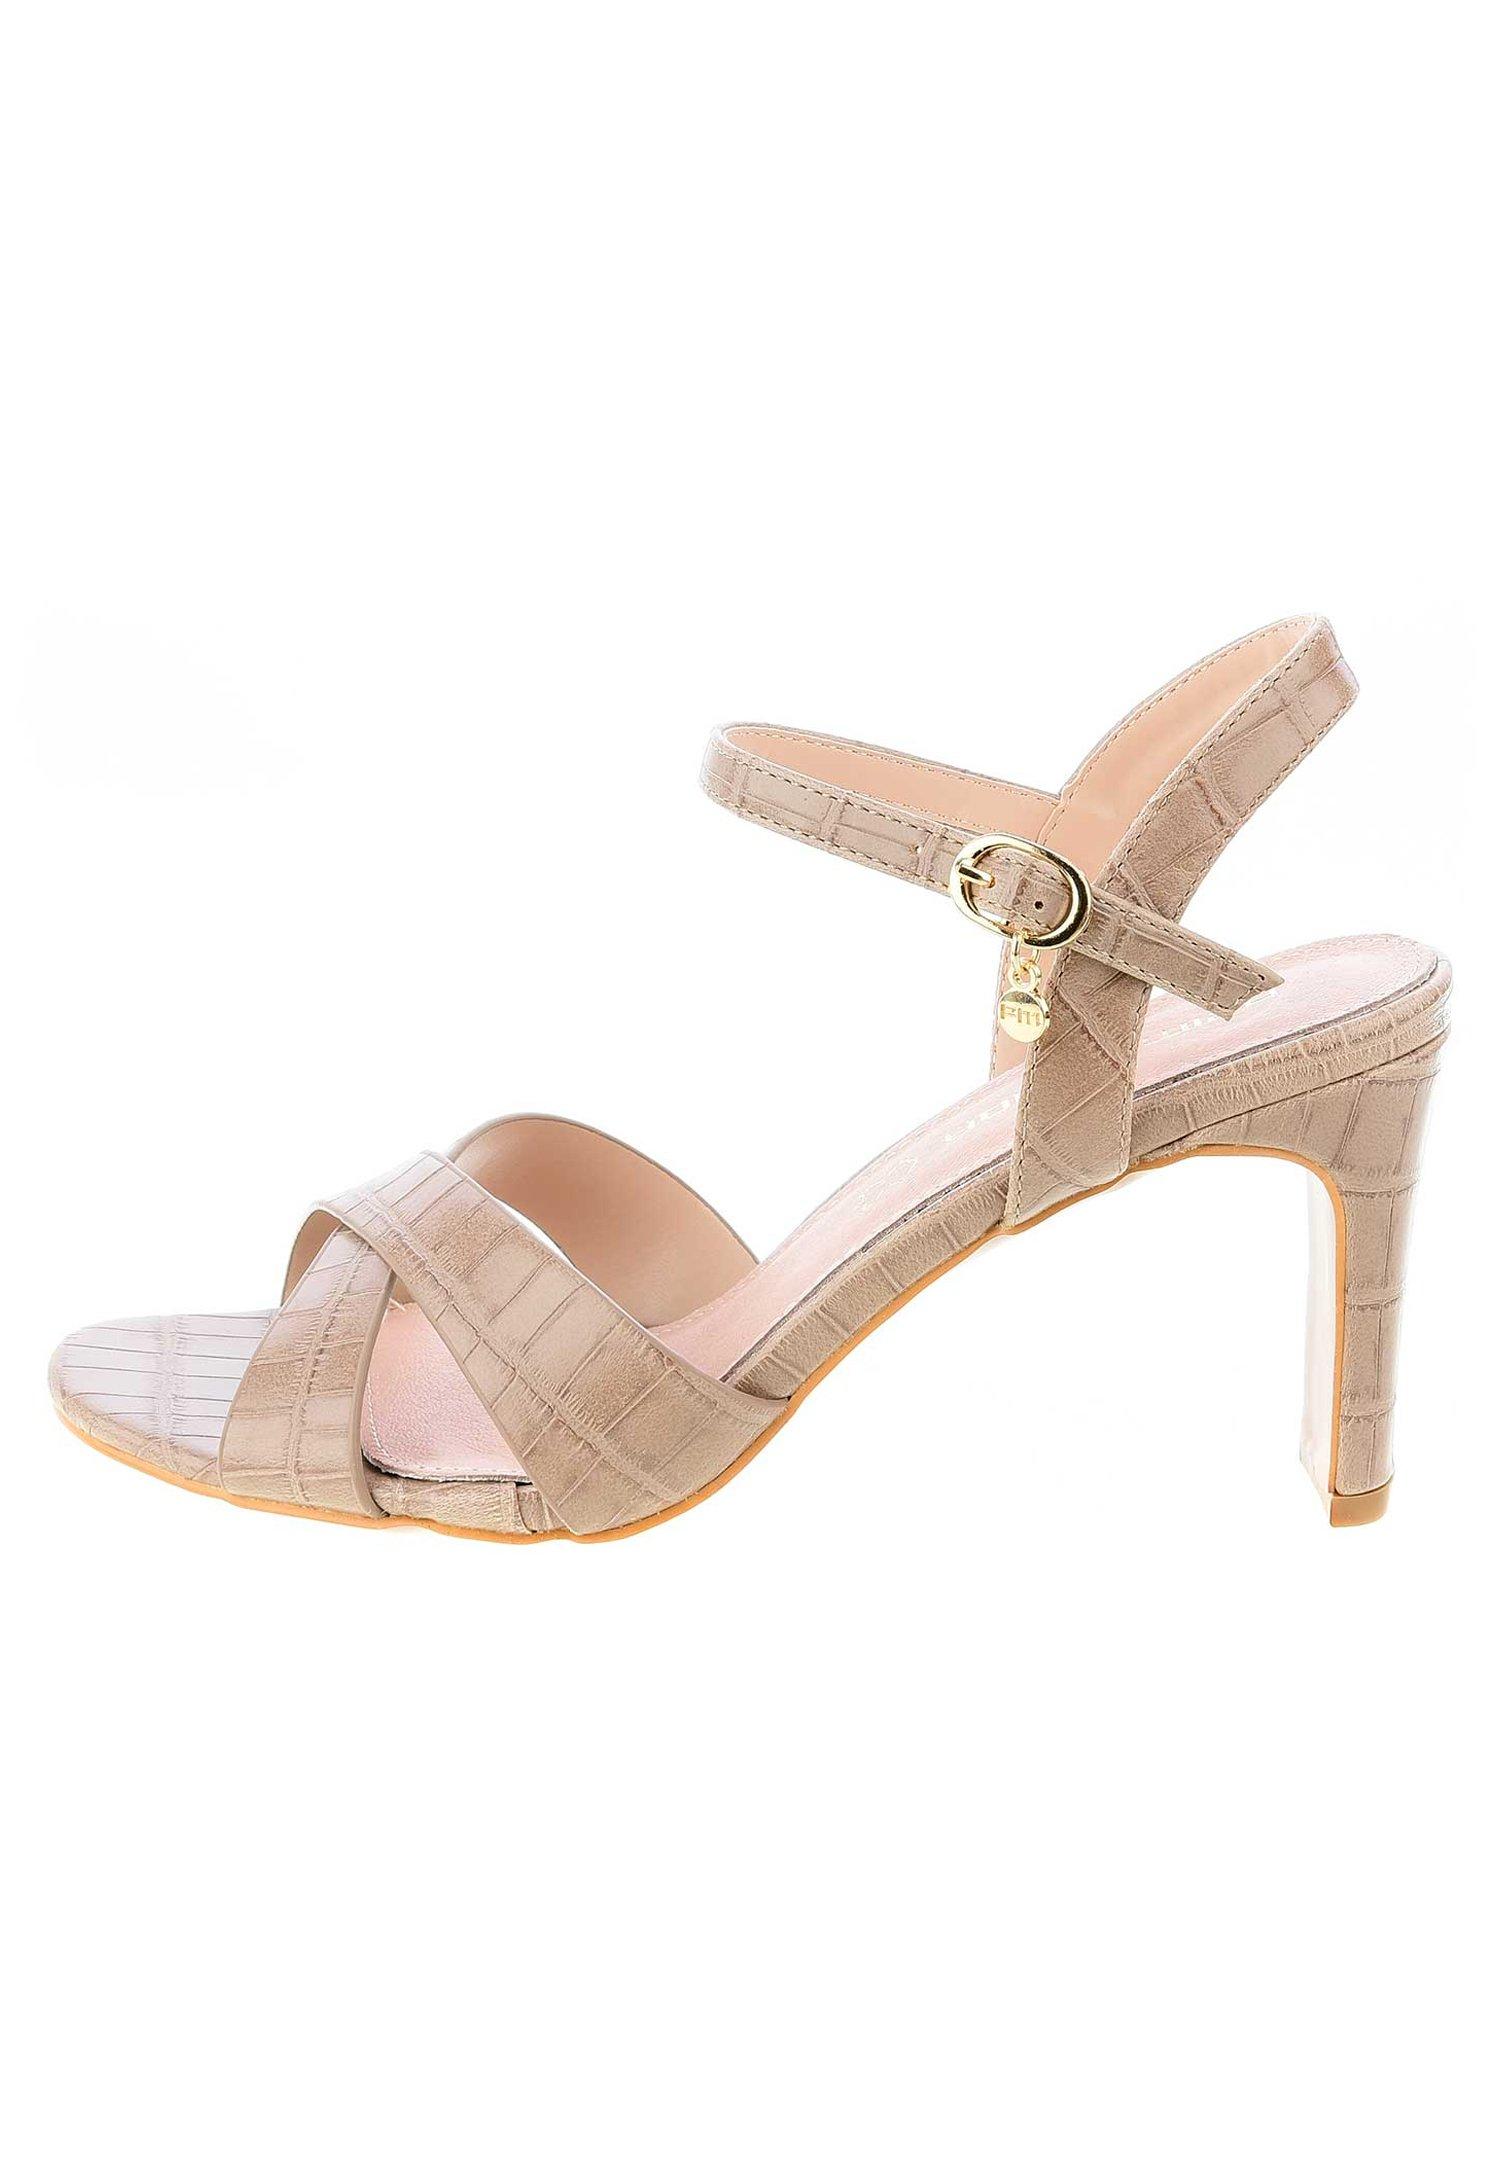 Sandaler med skaft | Dam | Rea online på Zalando.se